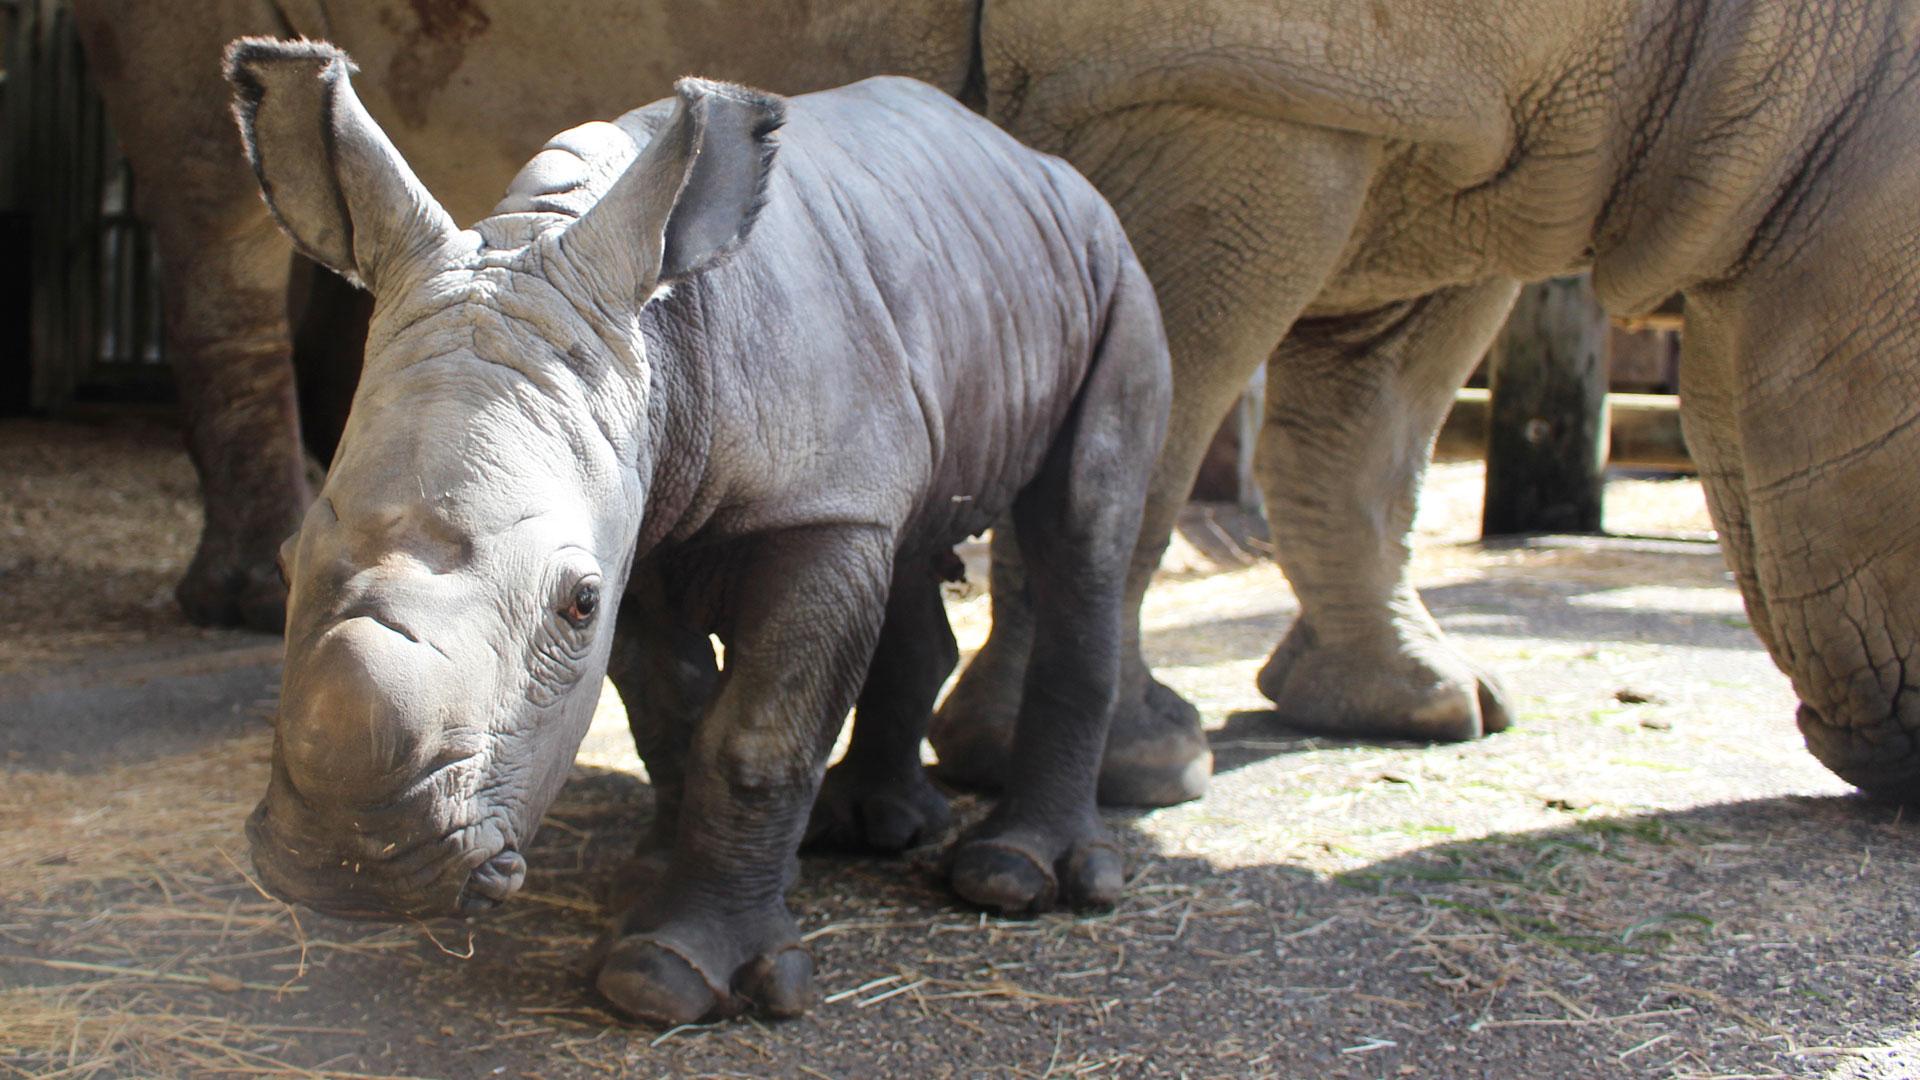 https://rfacdn.nz/zoo/assets/media/rhino-calf-gallery-4.jpg